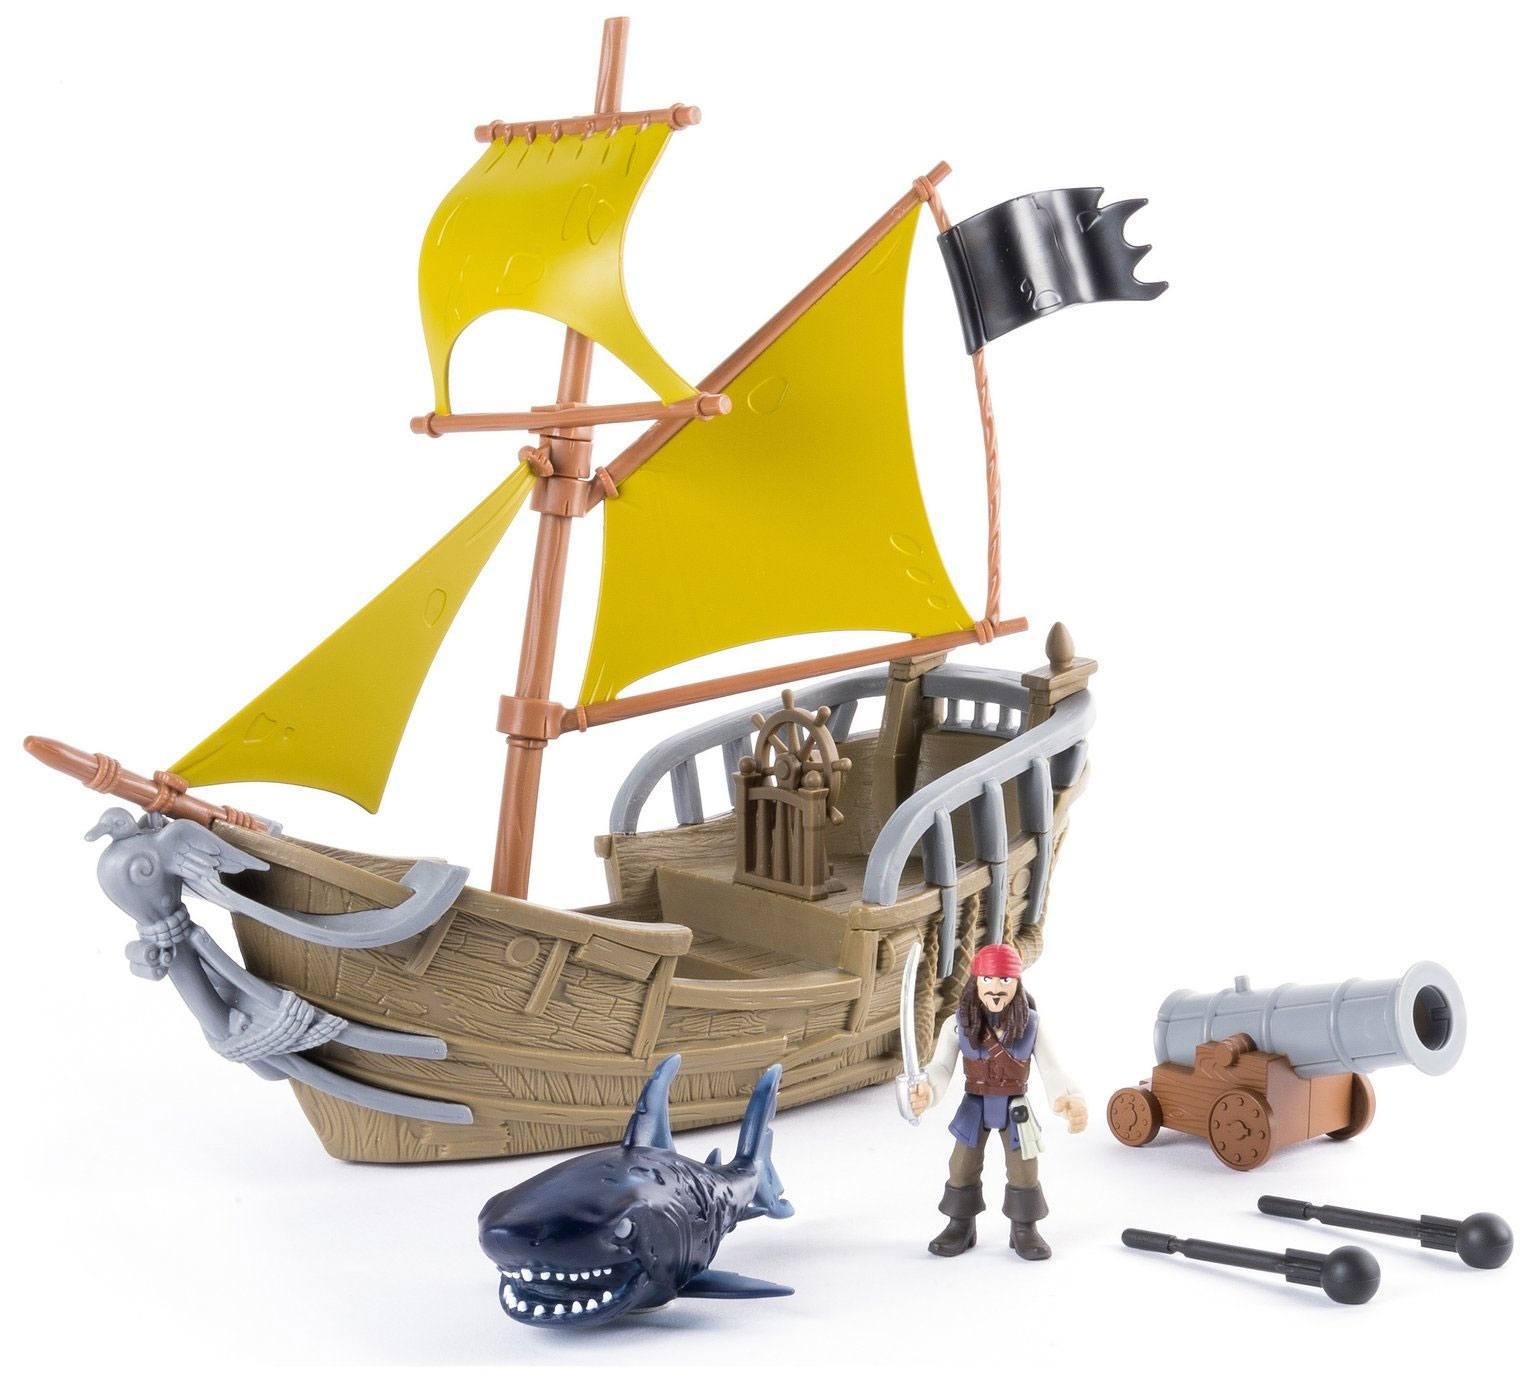 Pirates of the Caribbean Playset Jack's Pirate Ship